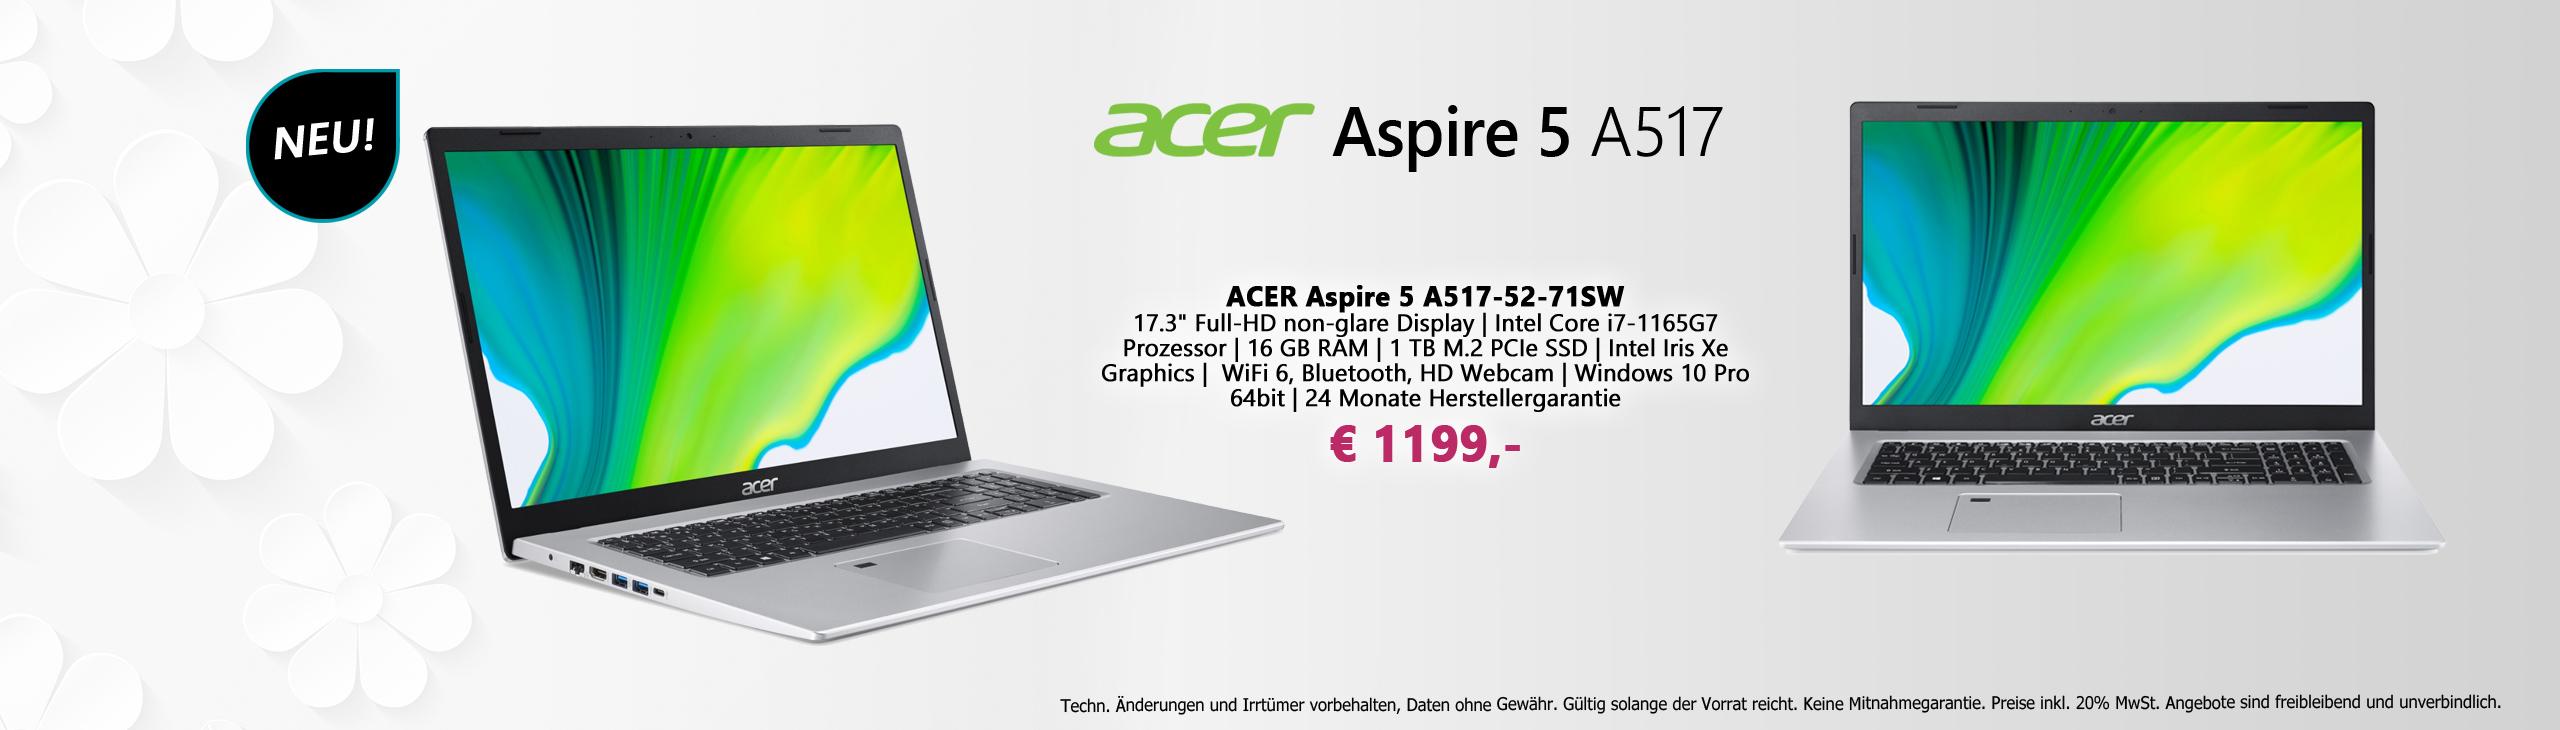 Banner Acer Aspire 5 052021